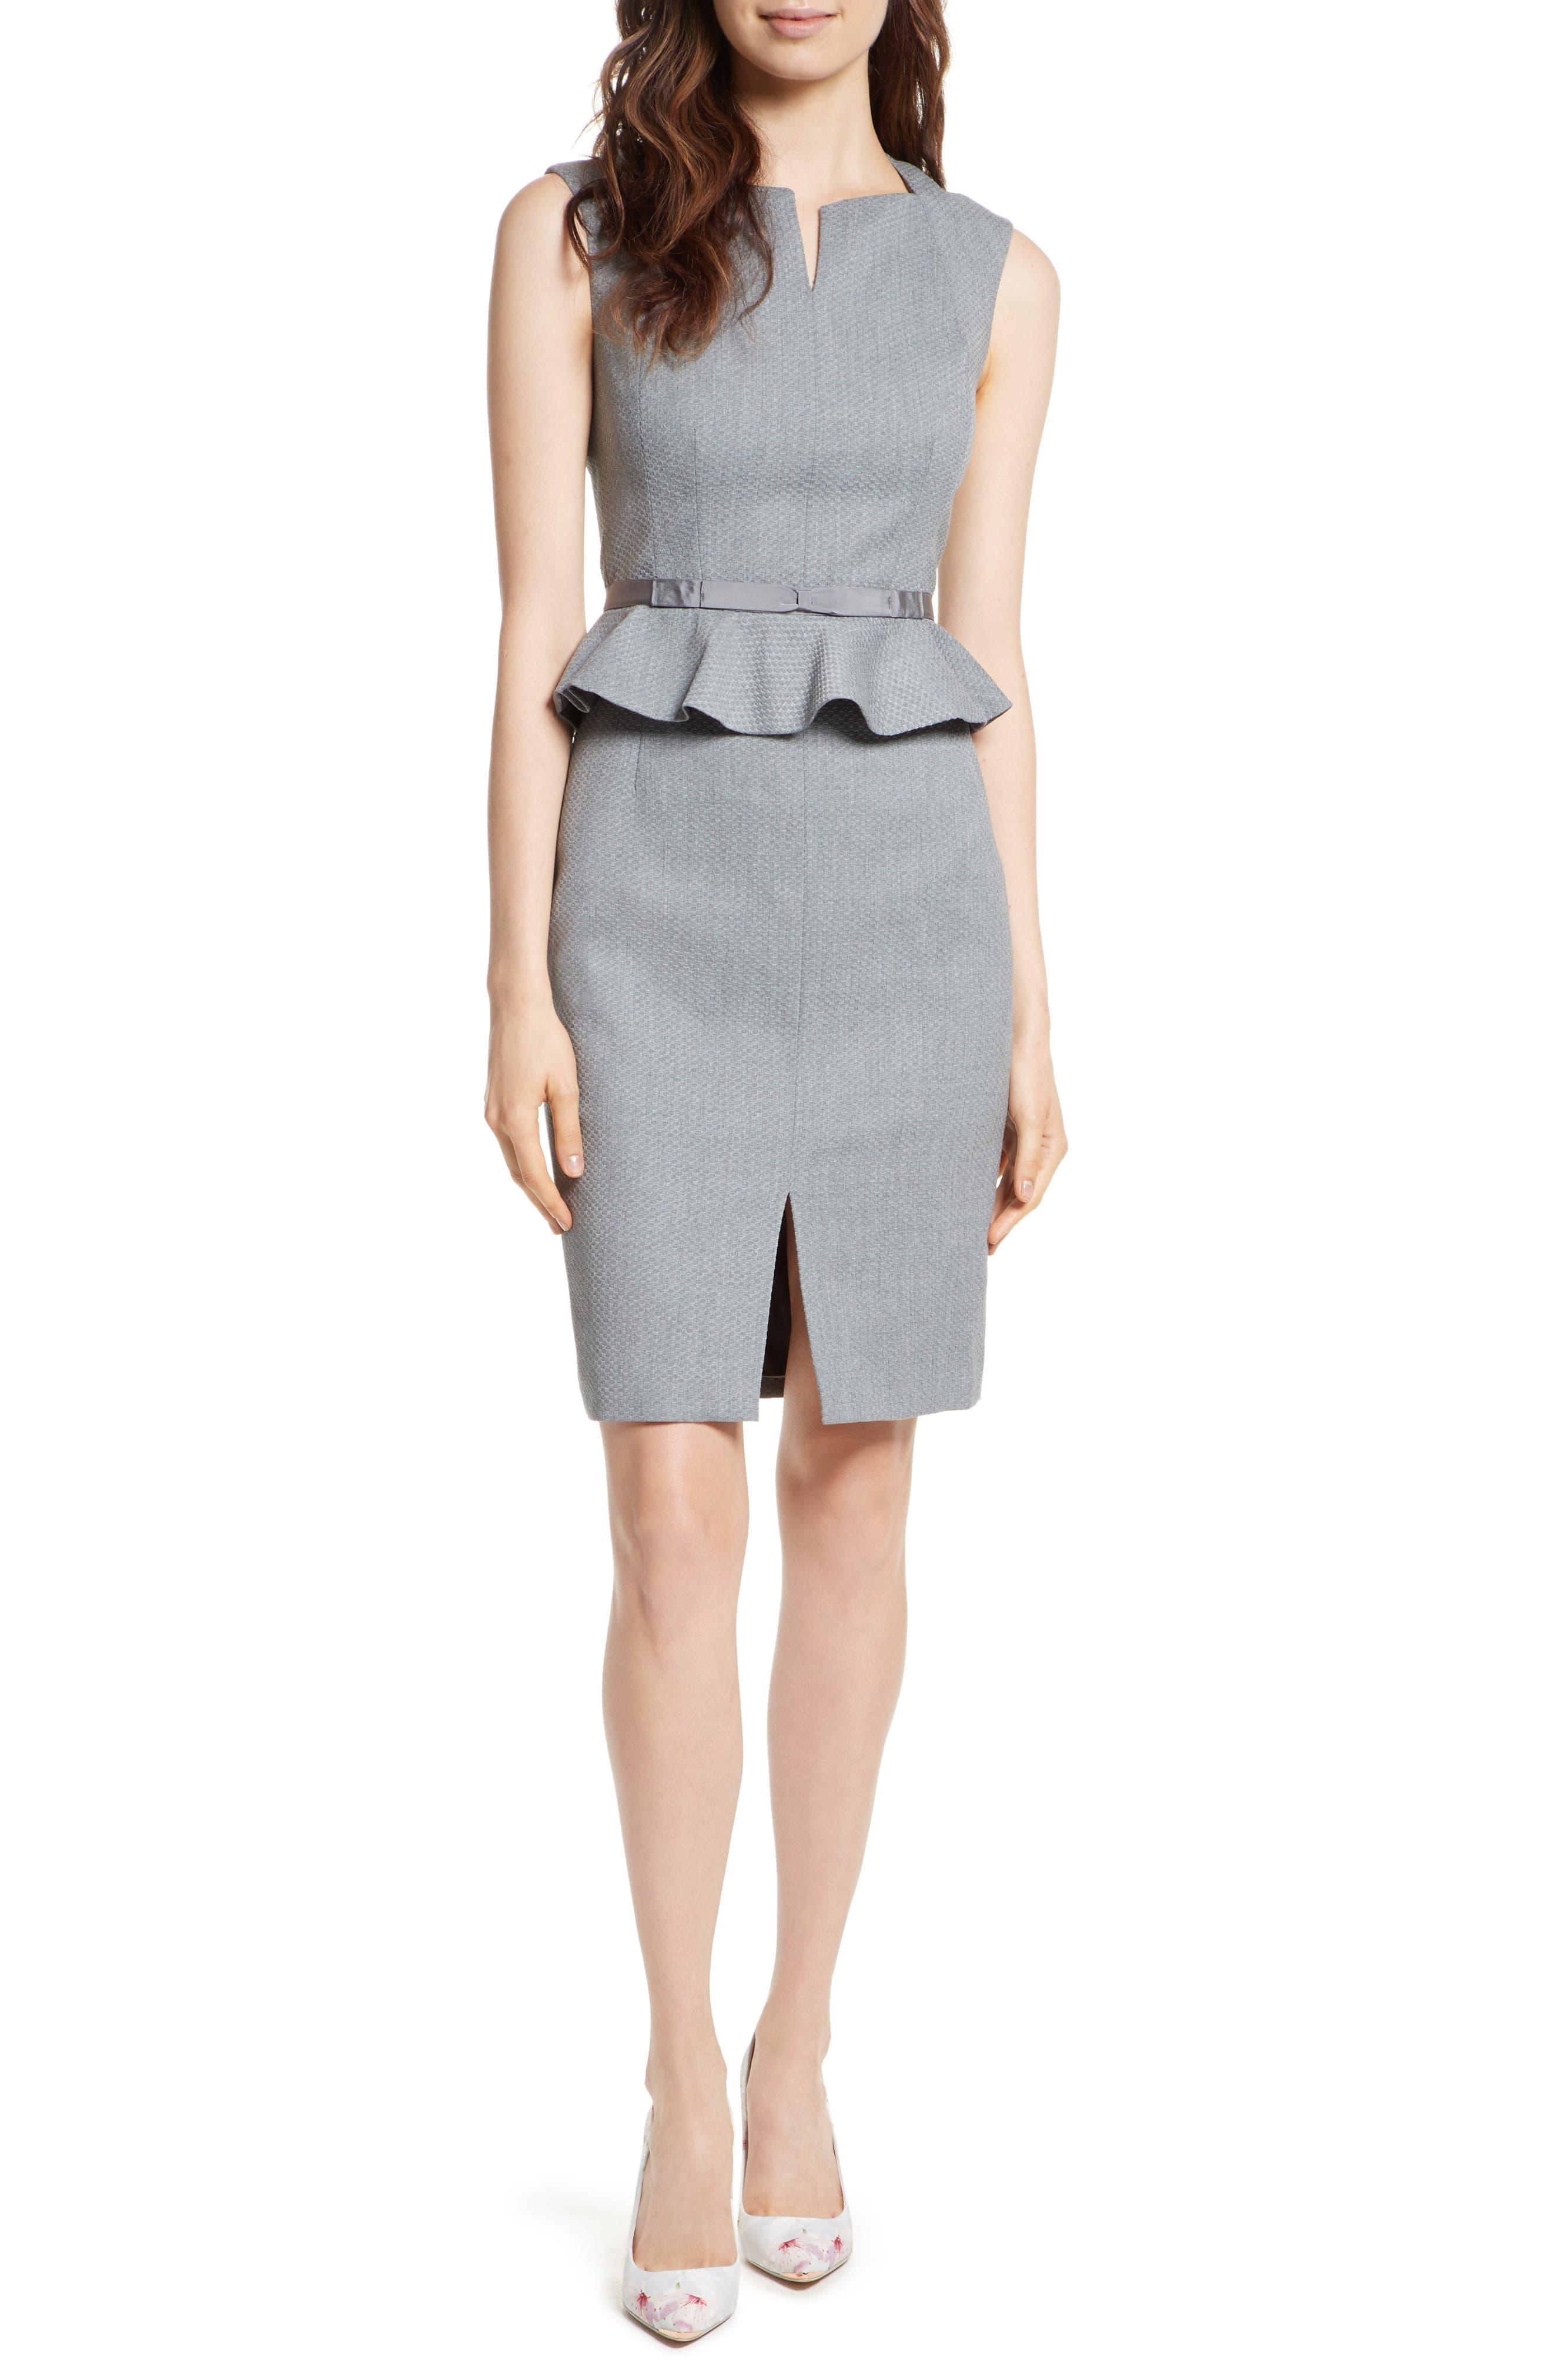 Nadaed Bow Detail Textured Peplum Dress,                             Main thumbnail 1, color,                             021